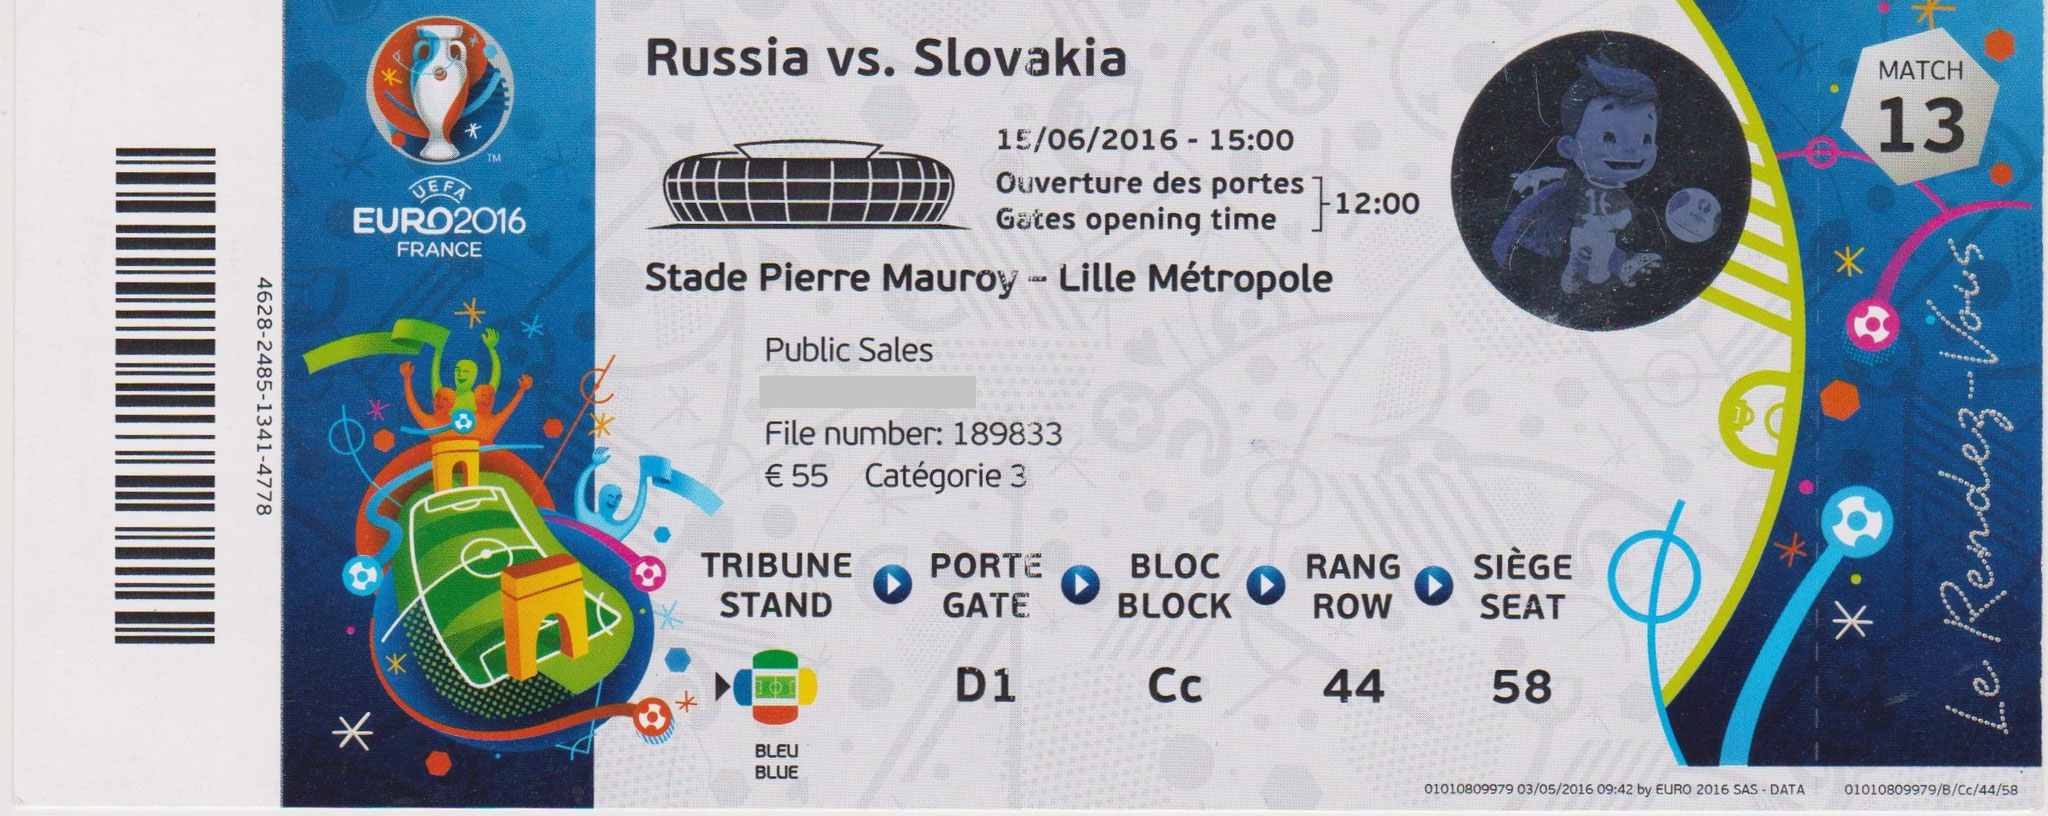 15/06/2016  Lille :  Rusie  1 - 2  Slovaquie  > Glushakov (Rus) -- Weiss, Hamsik  (Slov) <